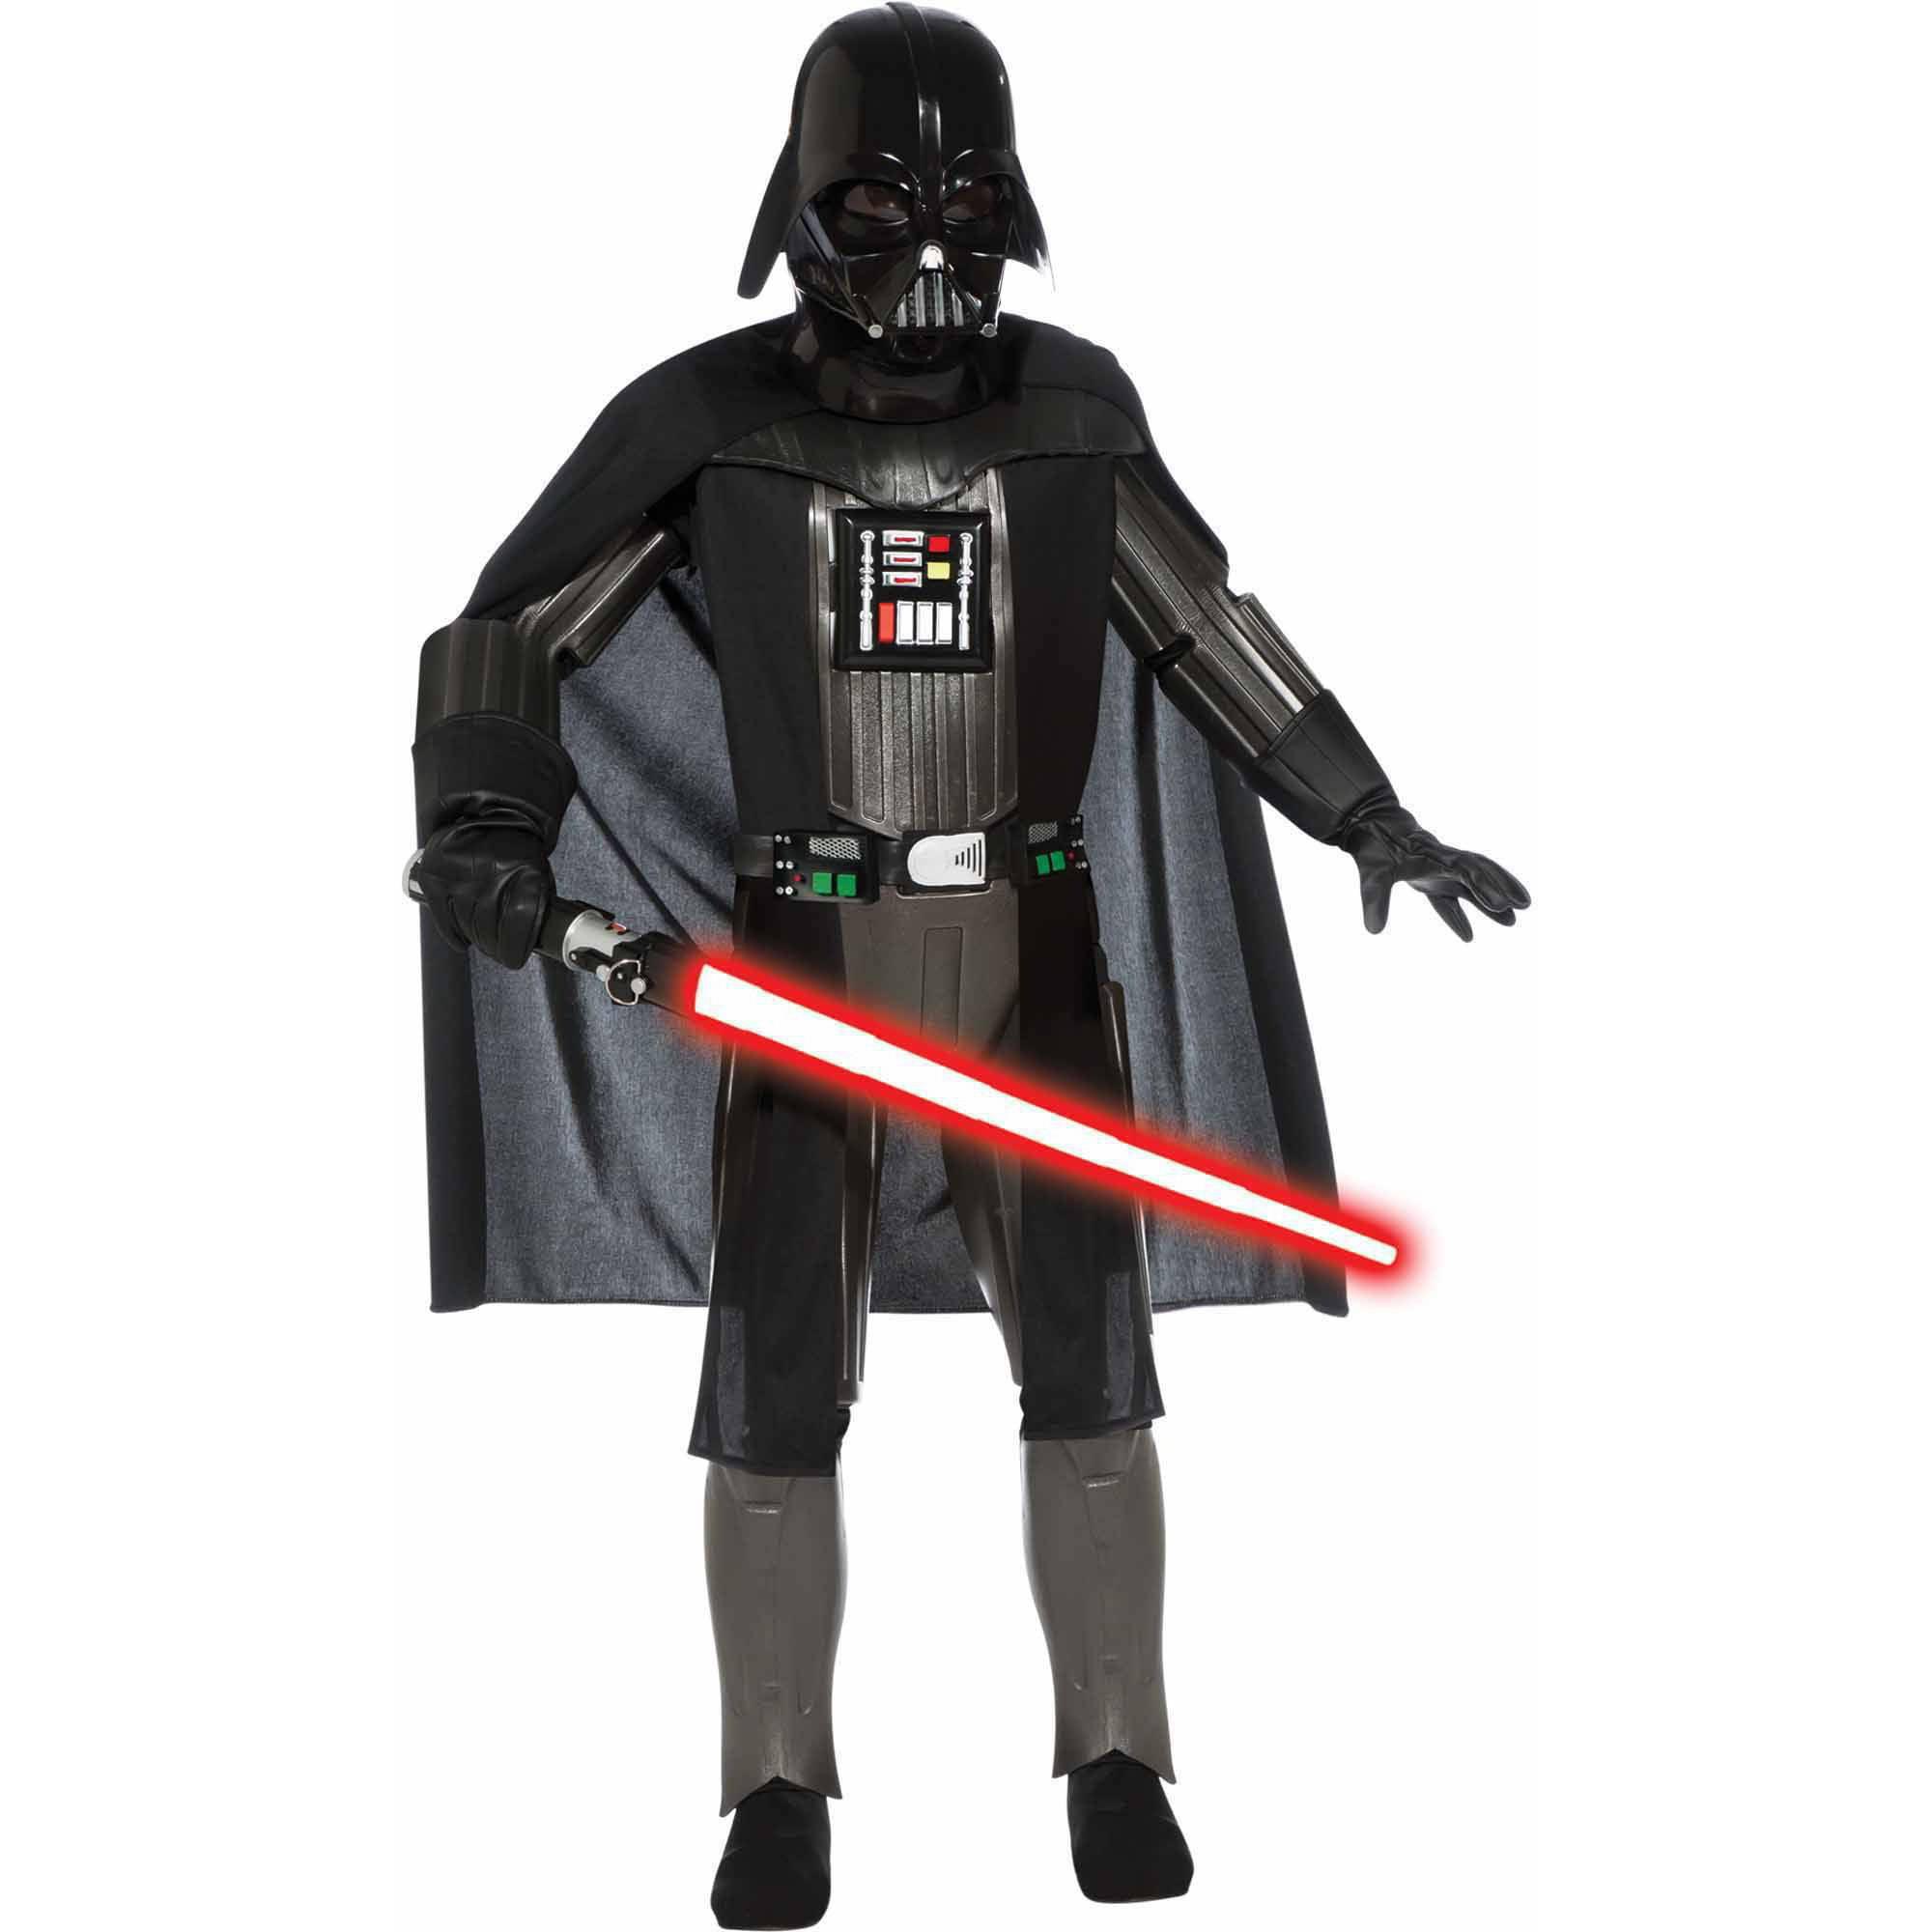 Darth Vader Deluxe Child Halloween Costume